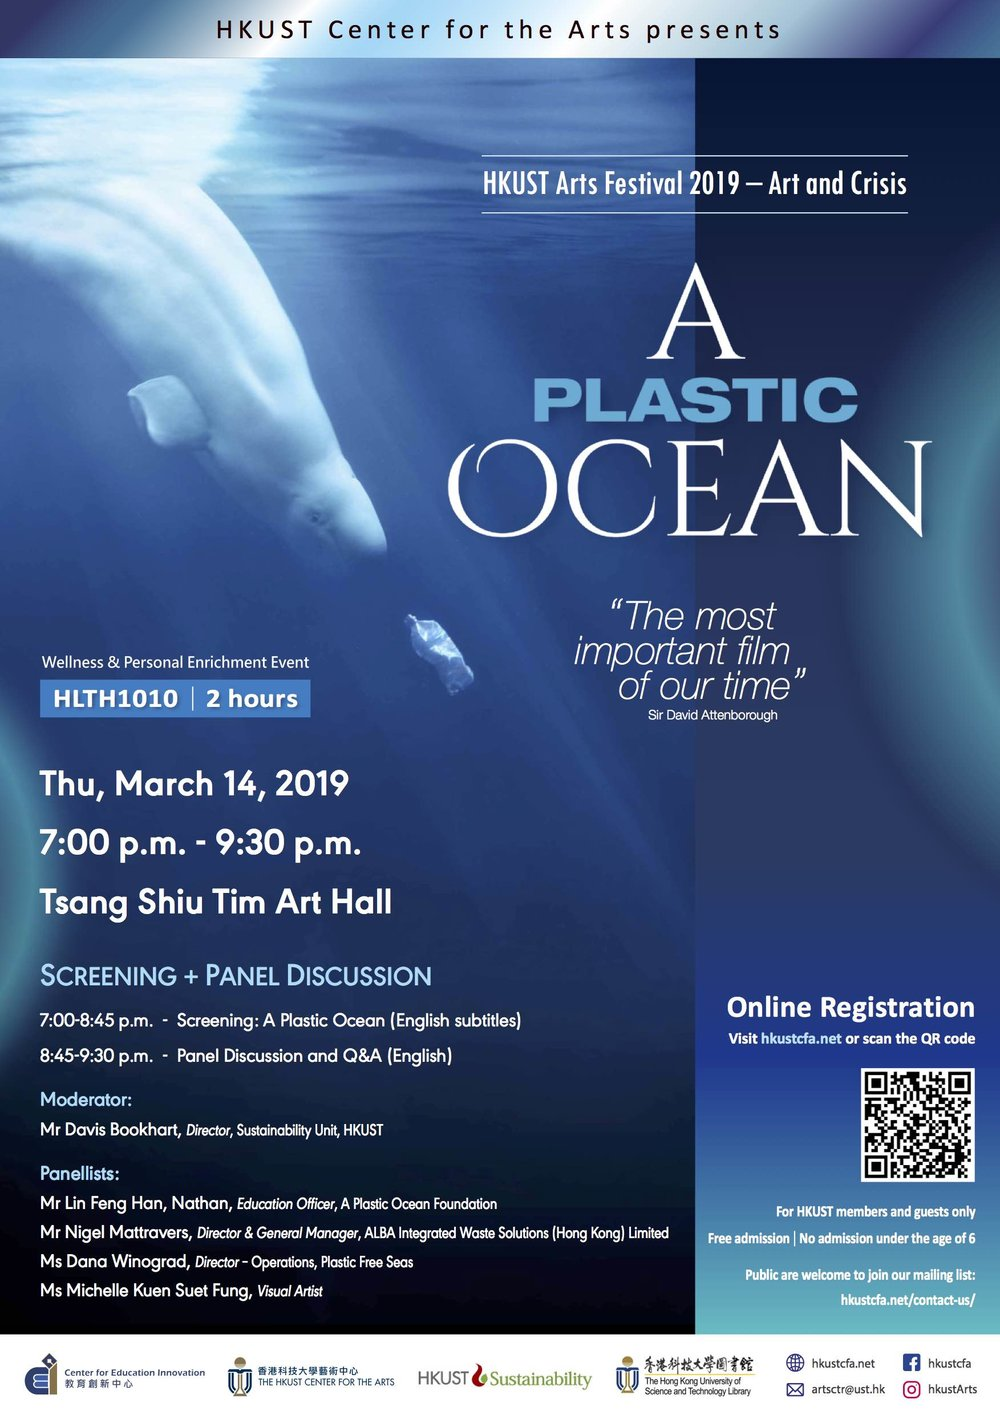 POSTER_Screening_A Plastic Ocean_190314_final_2.jpg